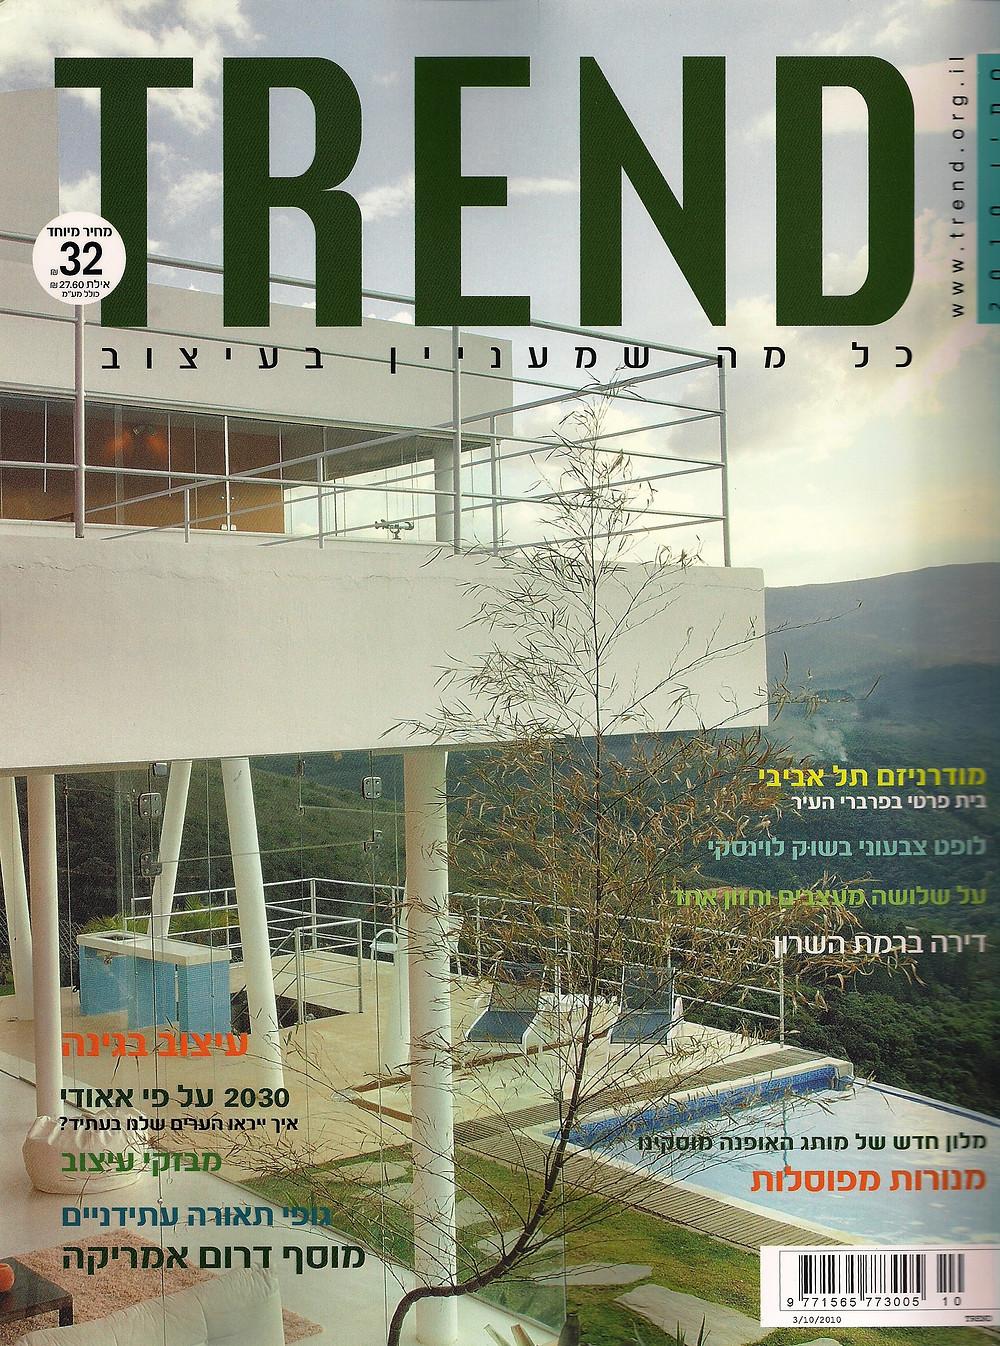 Casa EP, capa da revista Trend Magazine, Israel